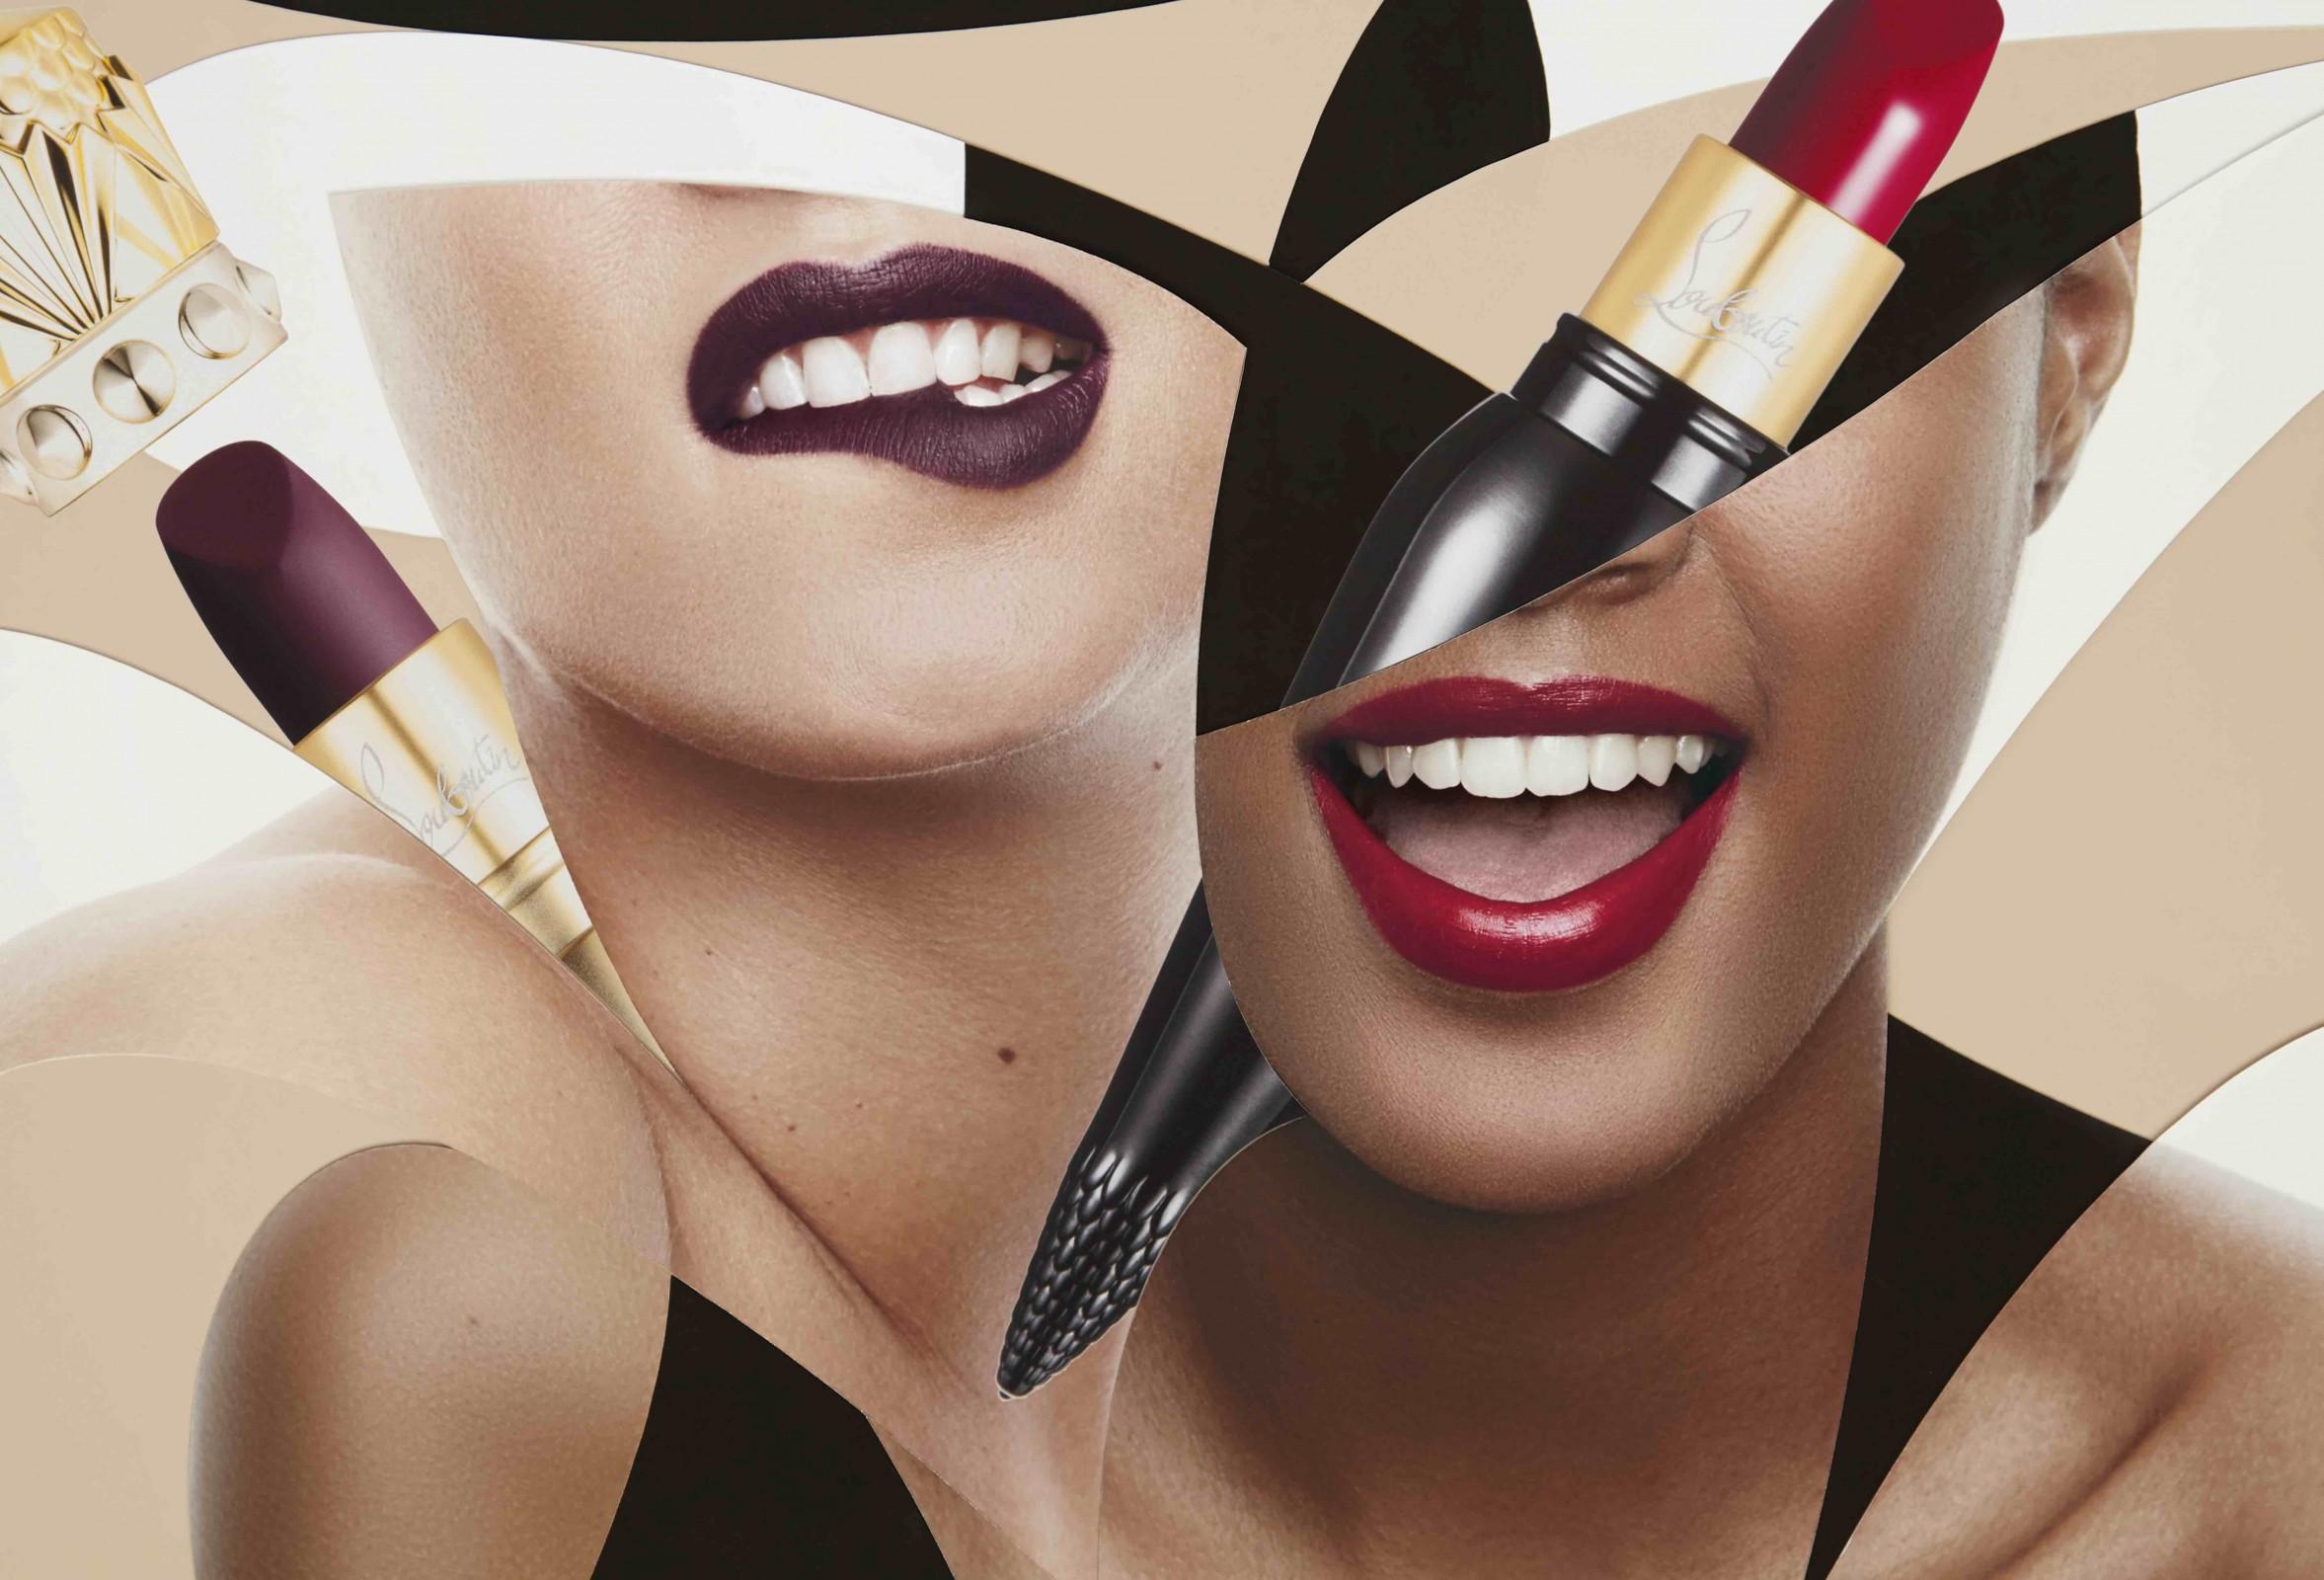 Louboutin Lips